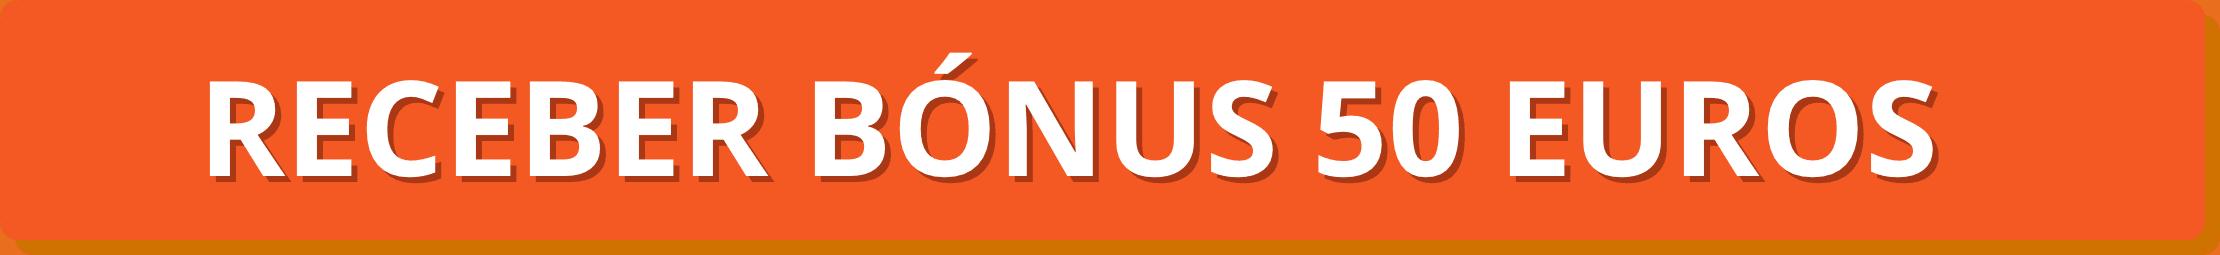 Betano Bónus de 50 euros